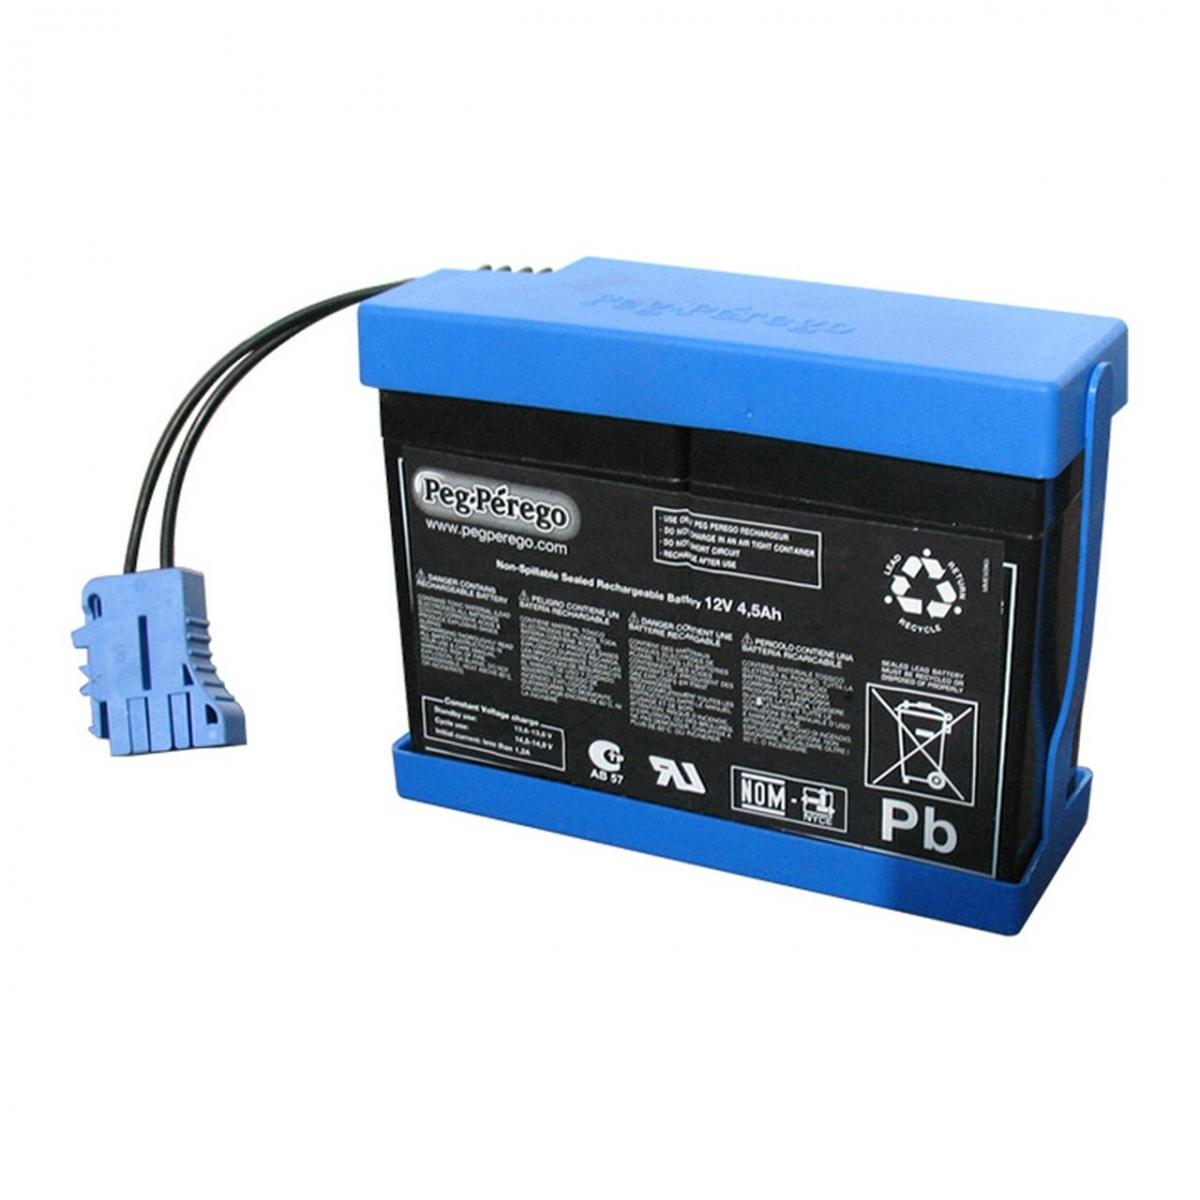 Peg Perego 12V- 4.5Ah Battery